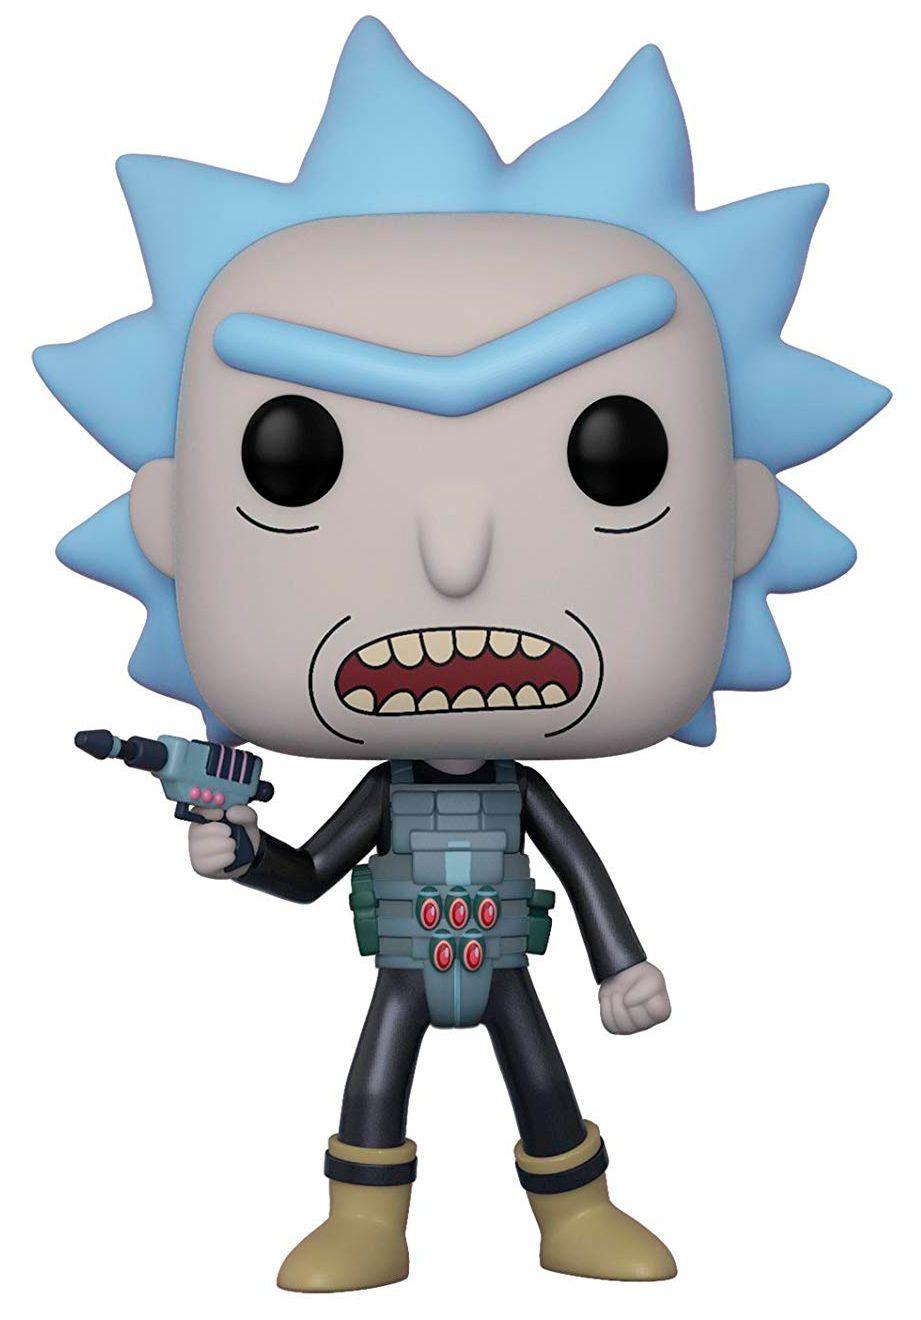 Funko Pop! Prioson Break Rick and Morty